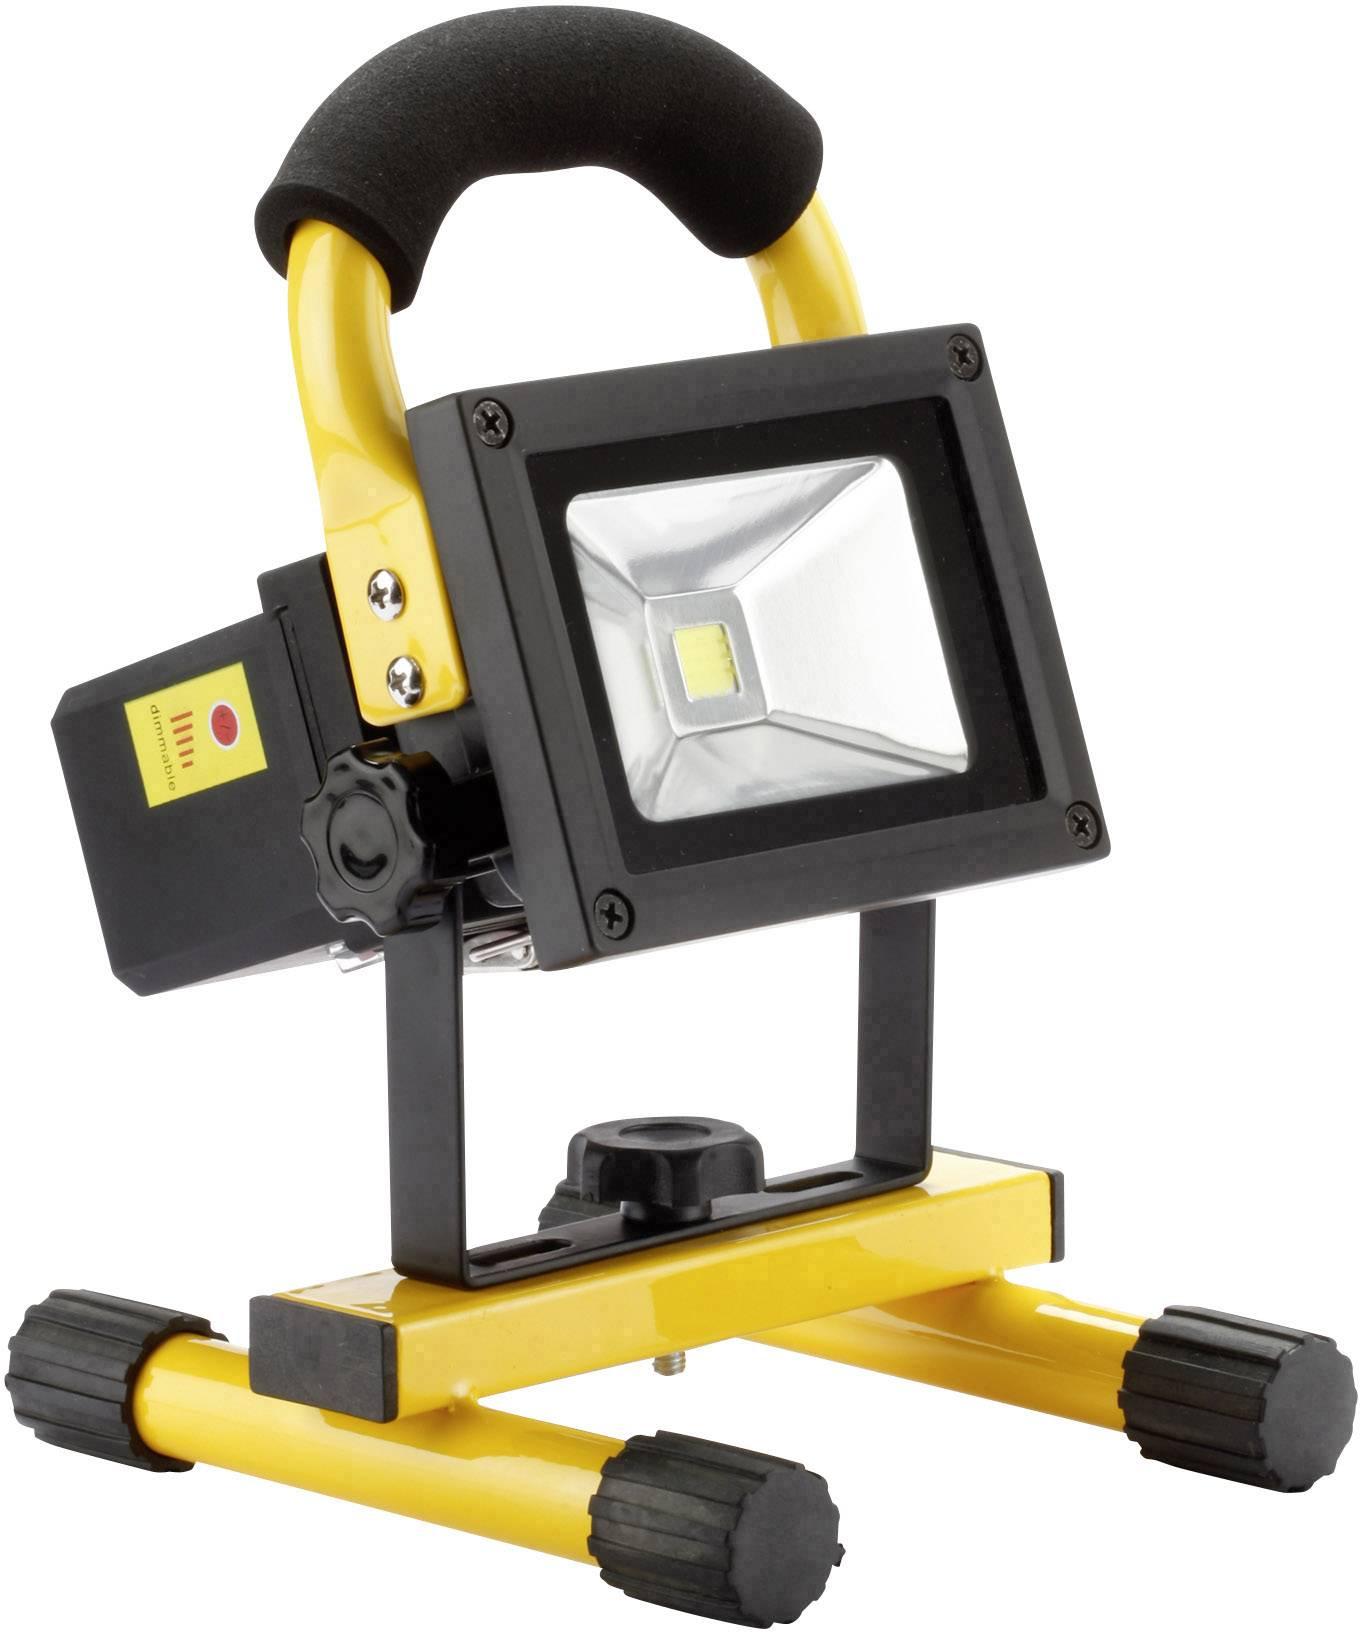 W 700 Lampe 09100 10 Travail Lm Ampercell De Cob Led 0ONmvnw8